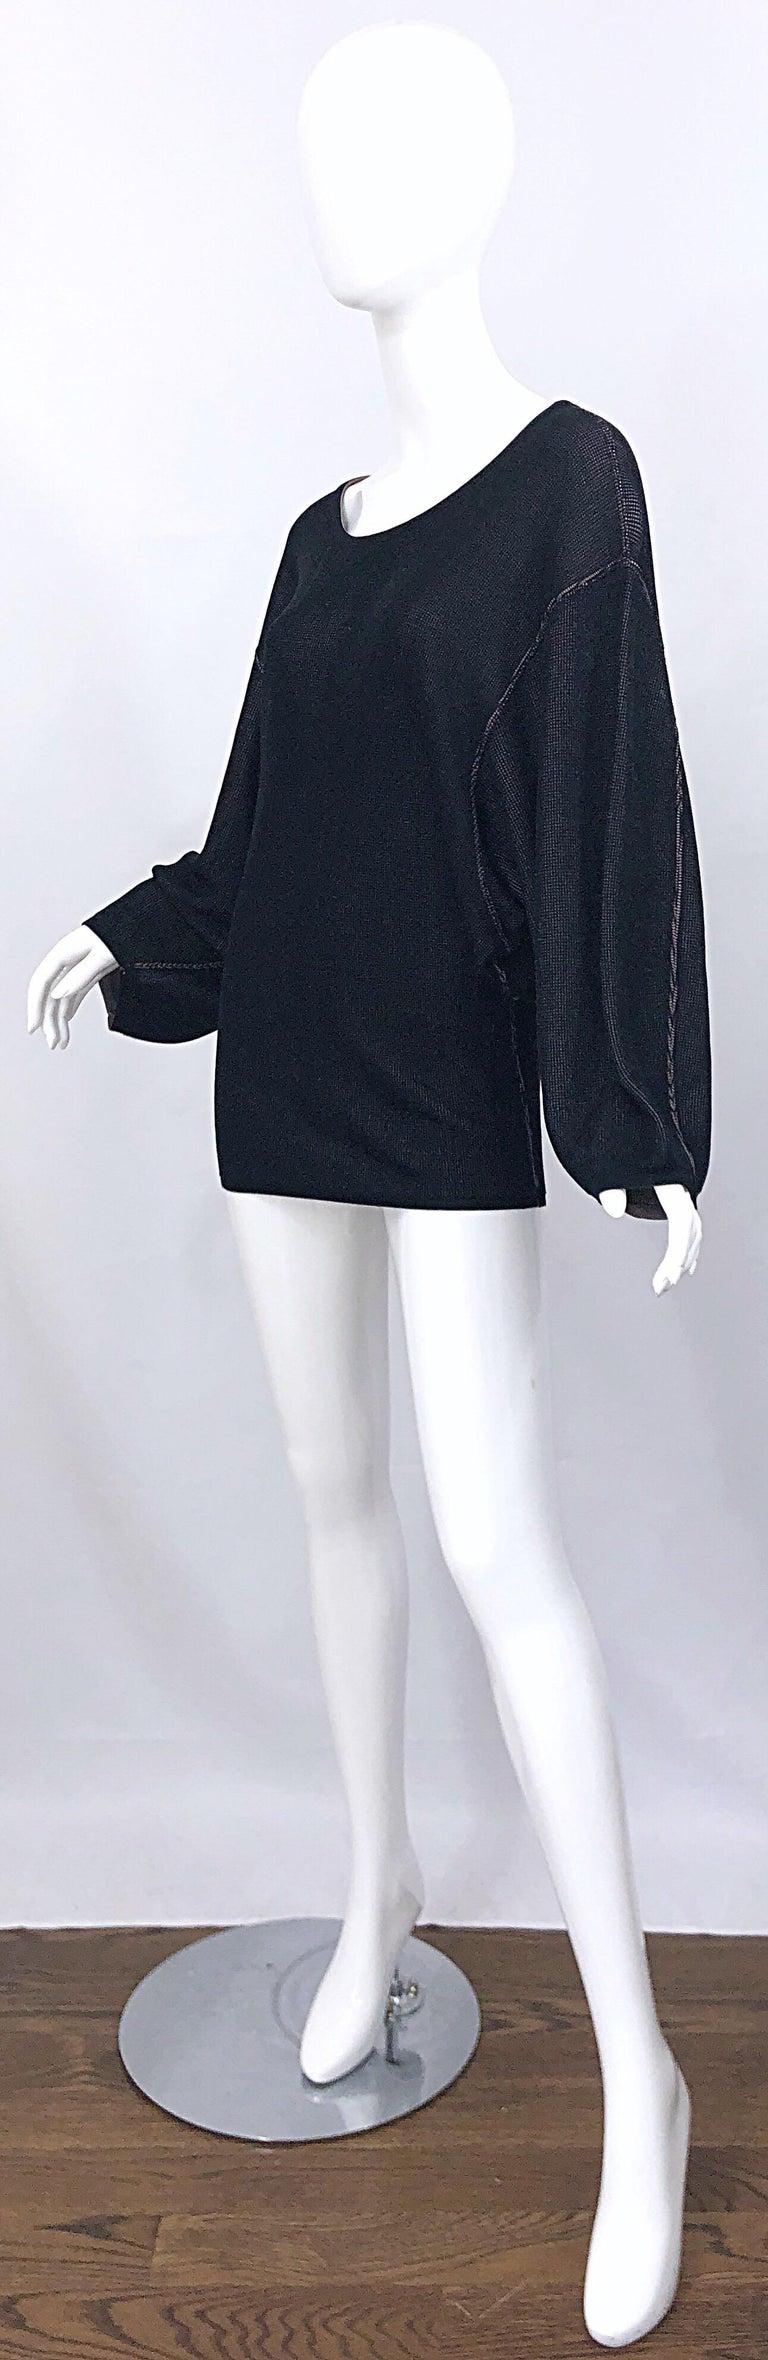 Vintage Azzedine Alaia 1980s  Black + Nude Viscose 80s Mini Sweater Dress Tunic For Sale 6